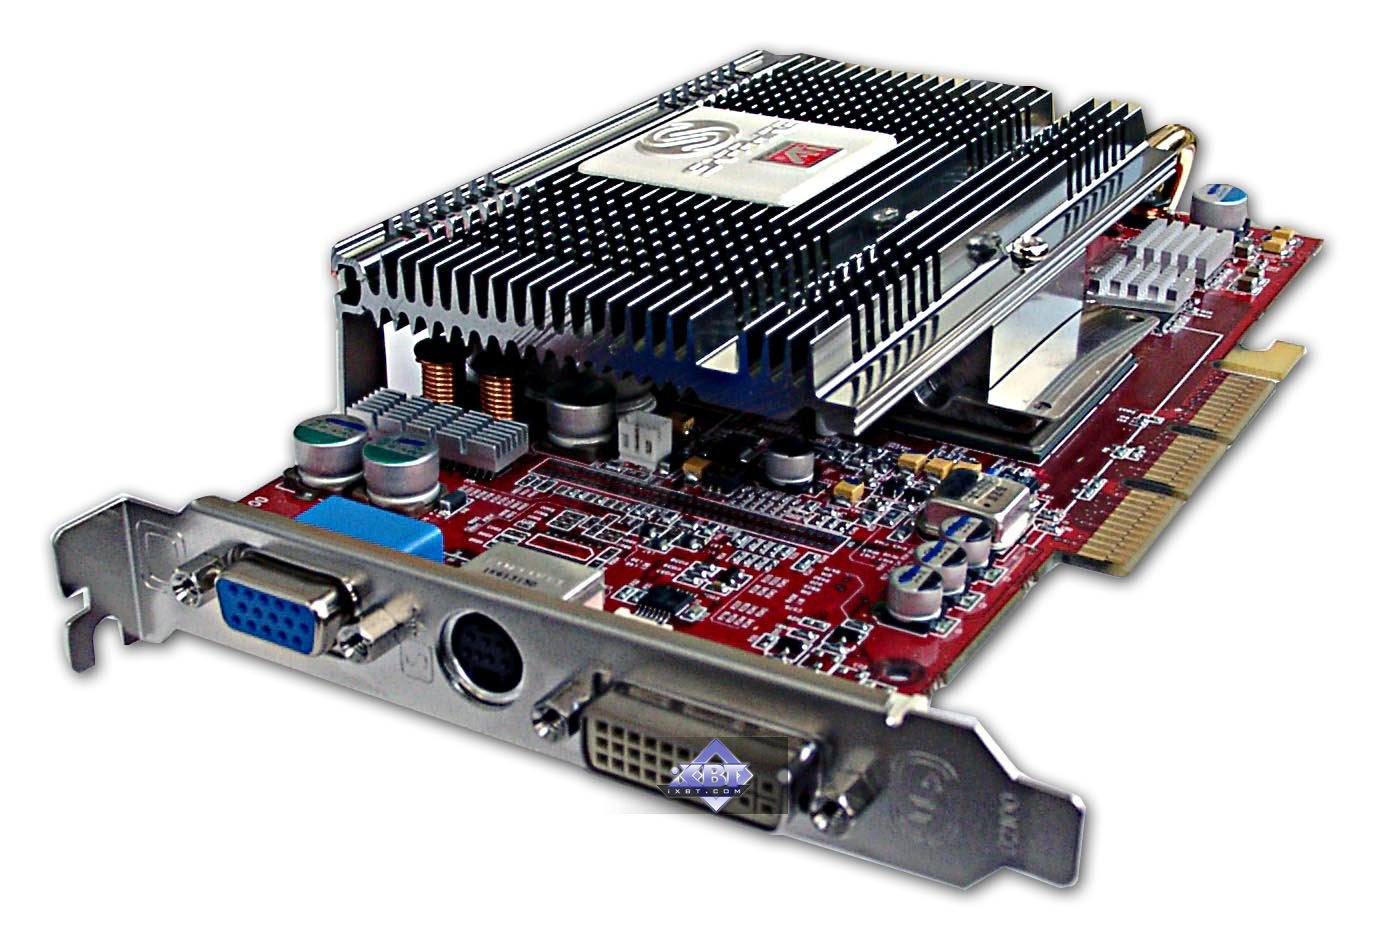 Sapphire Atlantis RADEON 9800 PRO 256MB Ultimate Edition